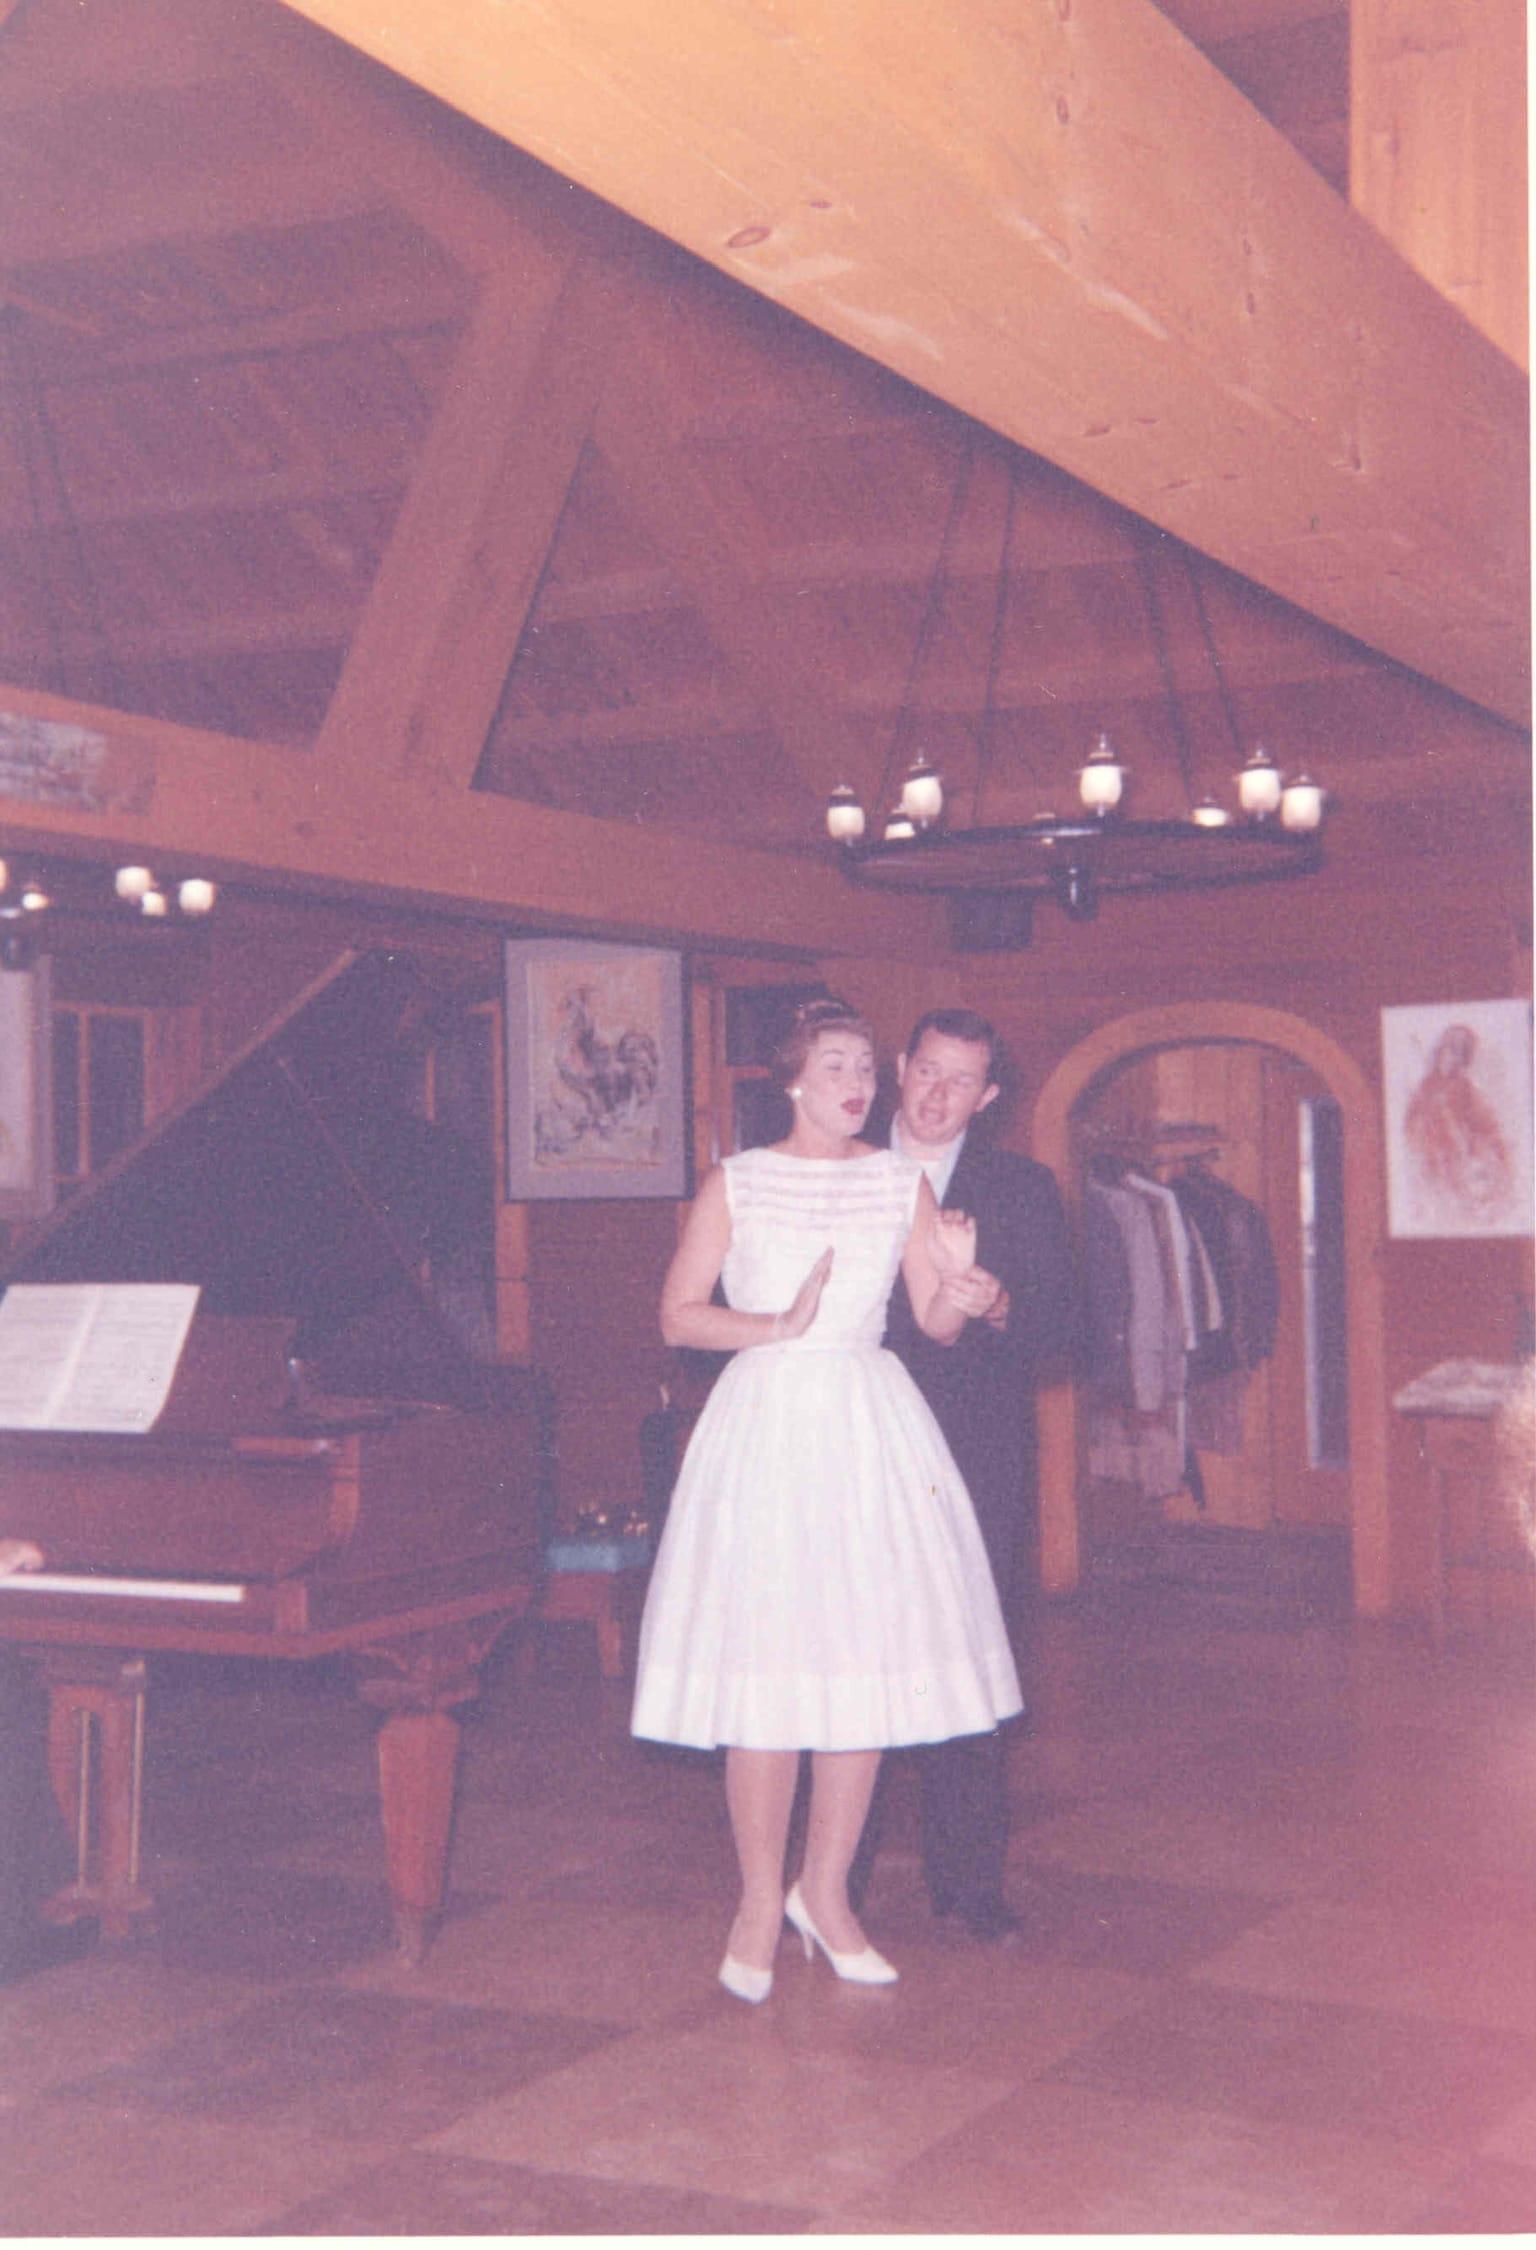 Vintage photo of Quisisana Resort and people dancing